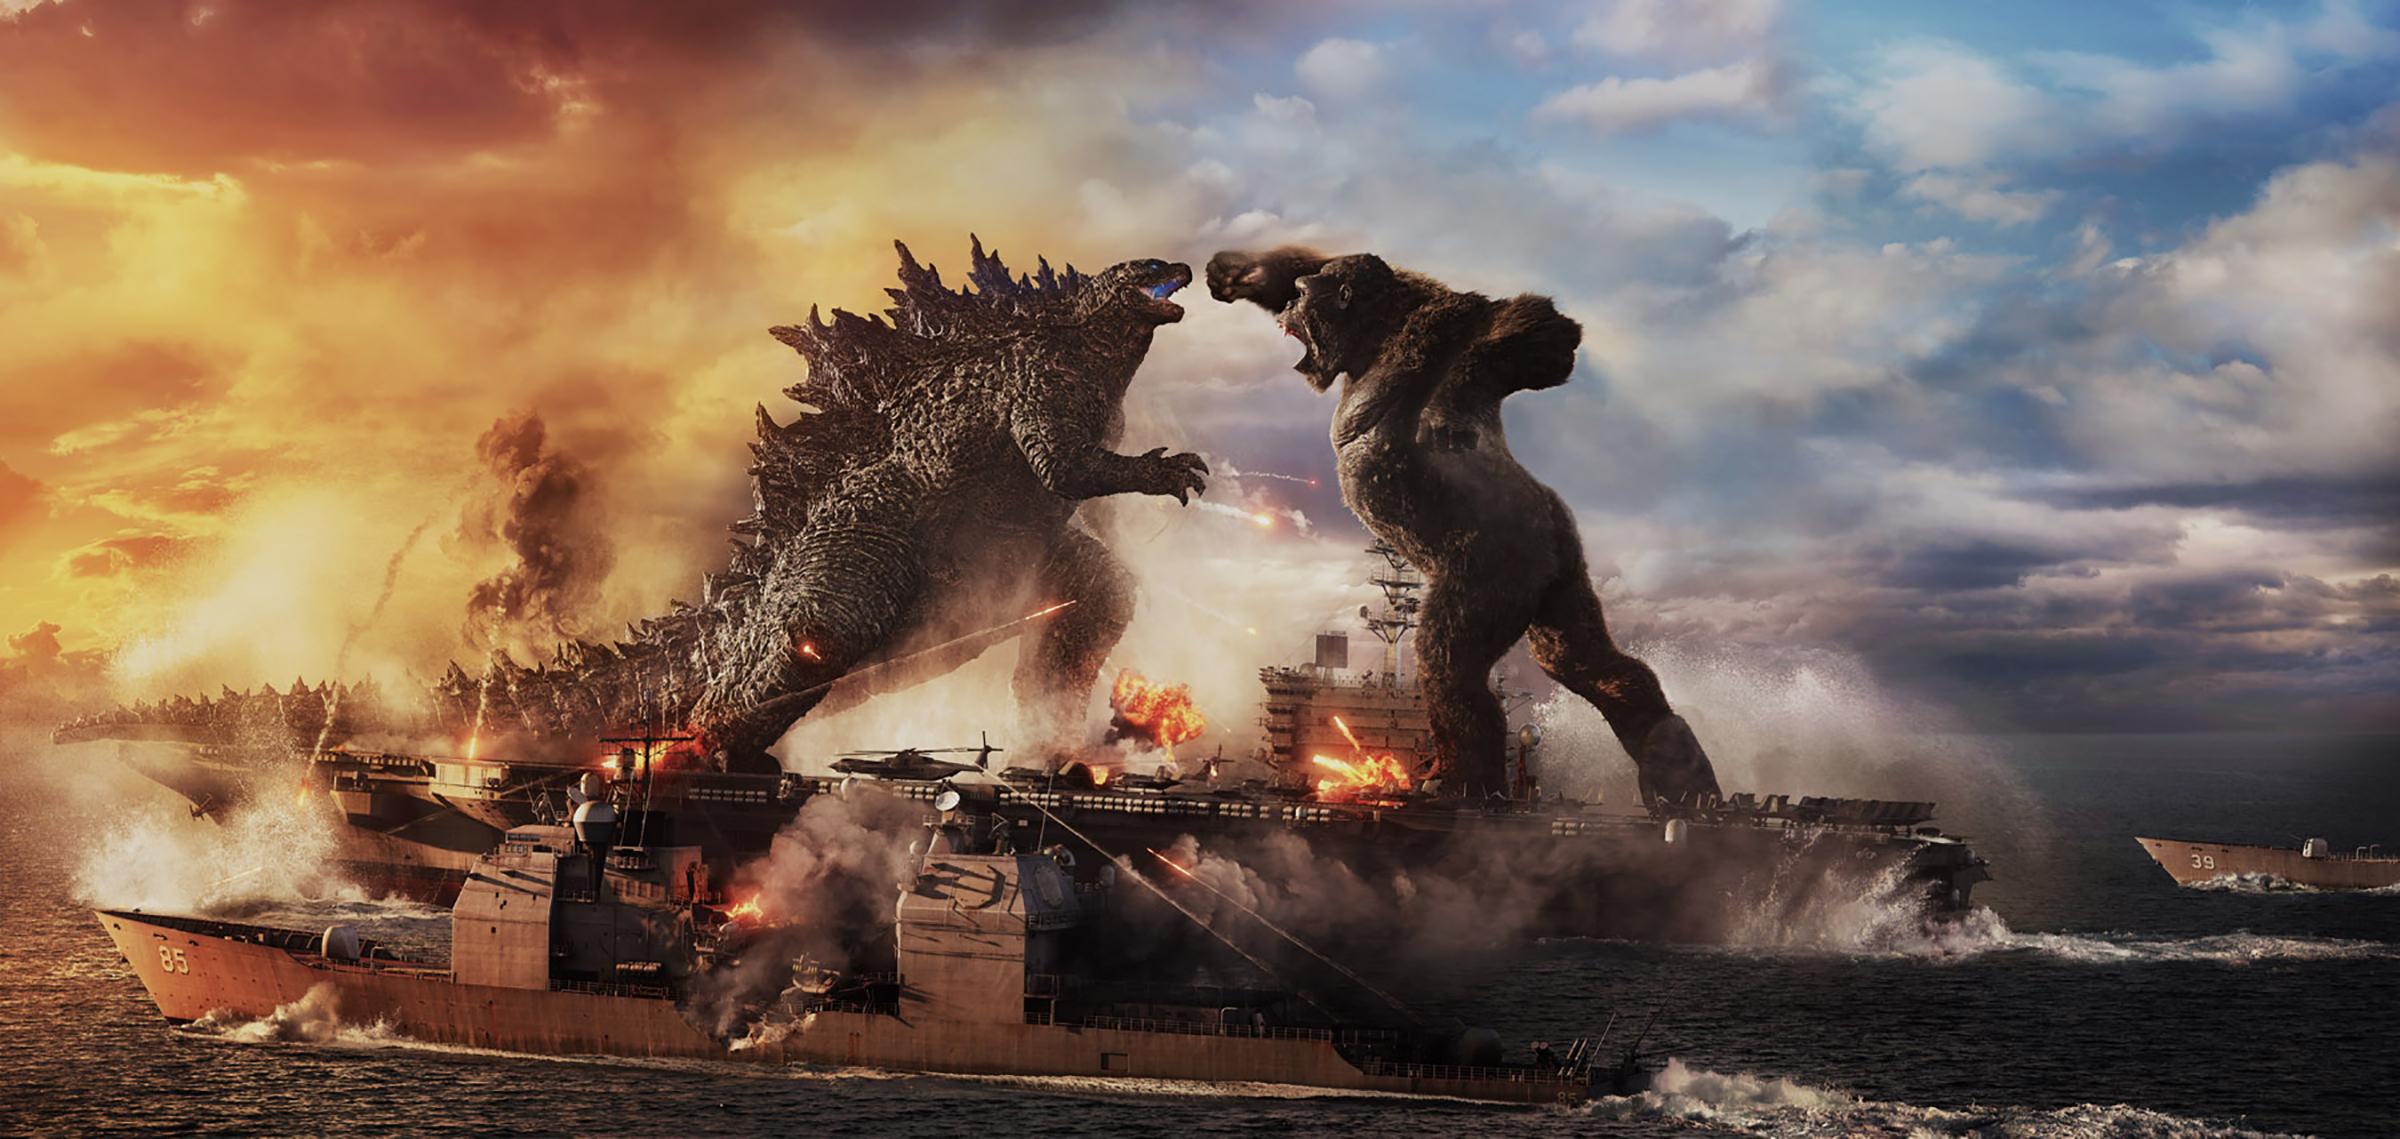 'Godzilla vs. Kong' Trailer: Legendary Movie Monsters Prepare for Ultimate Showdown